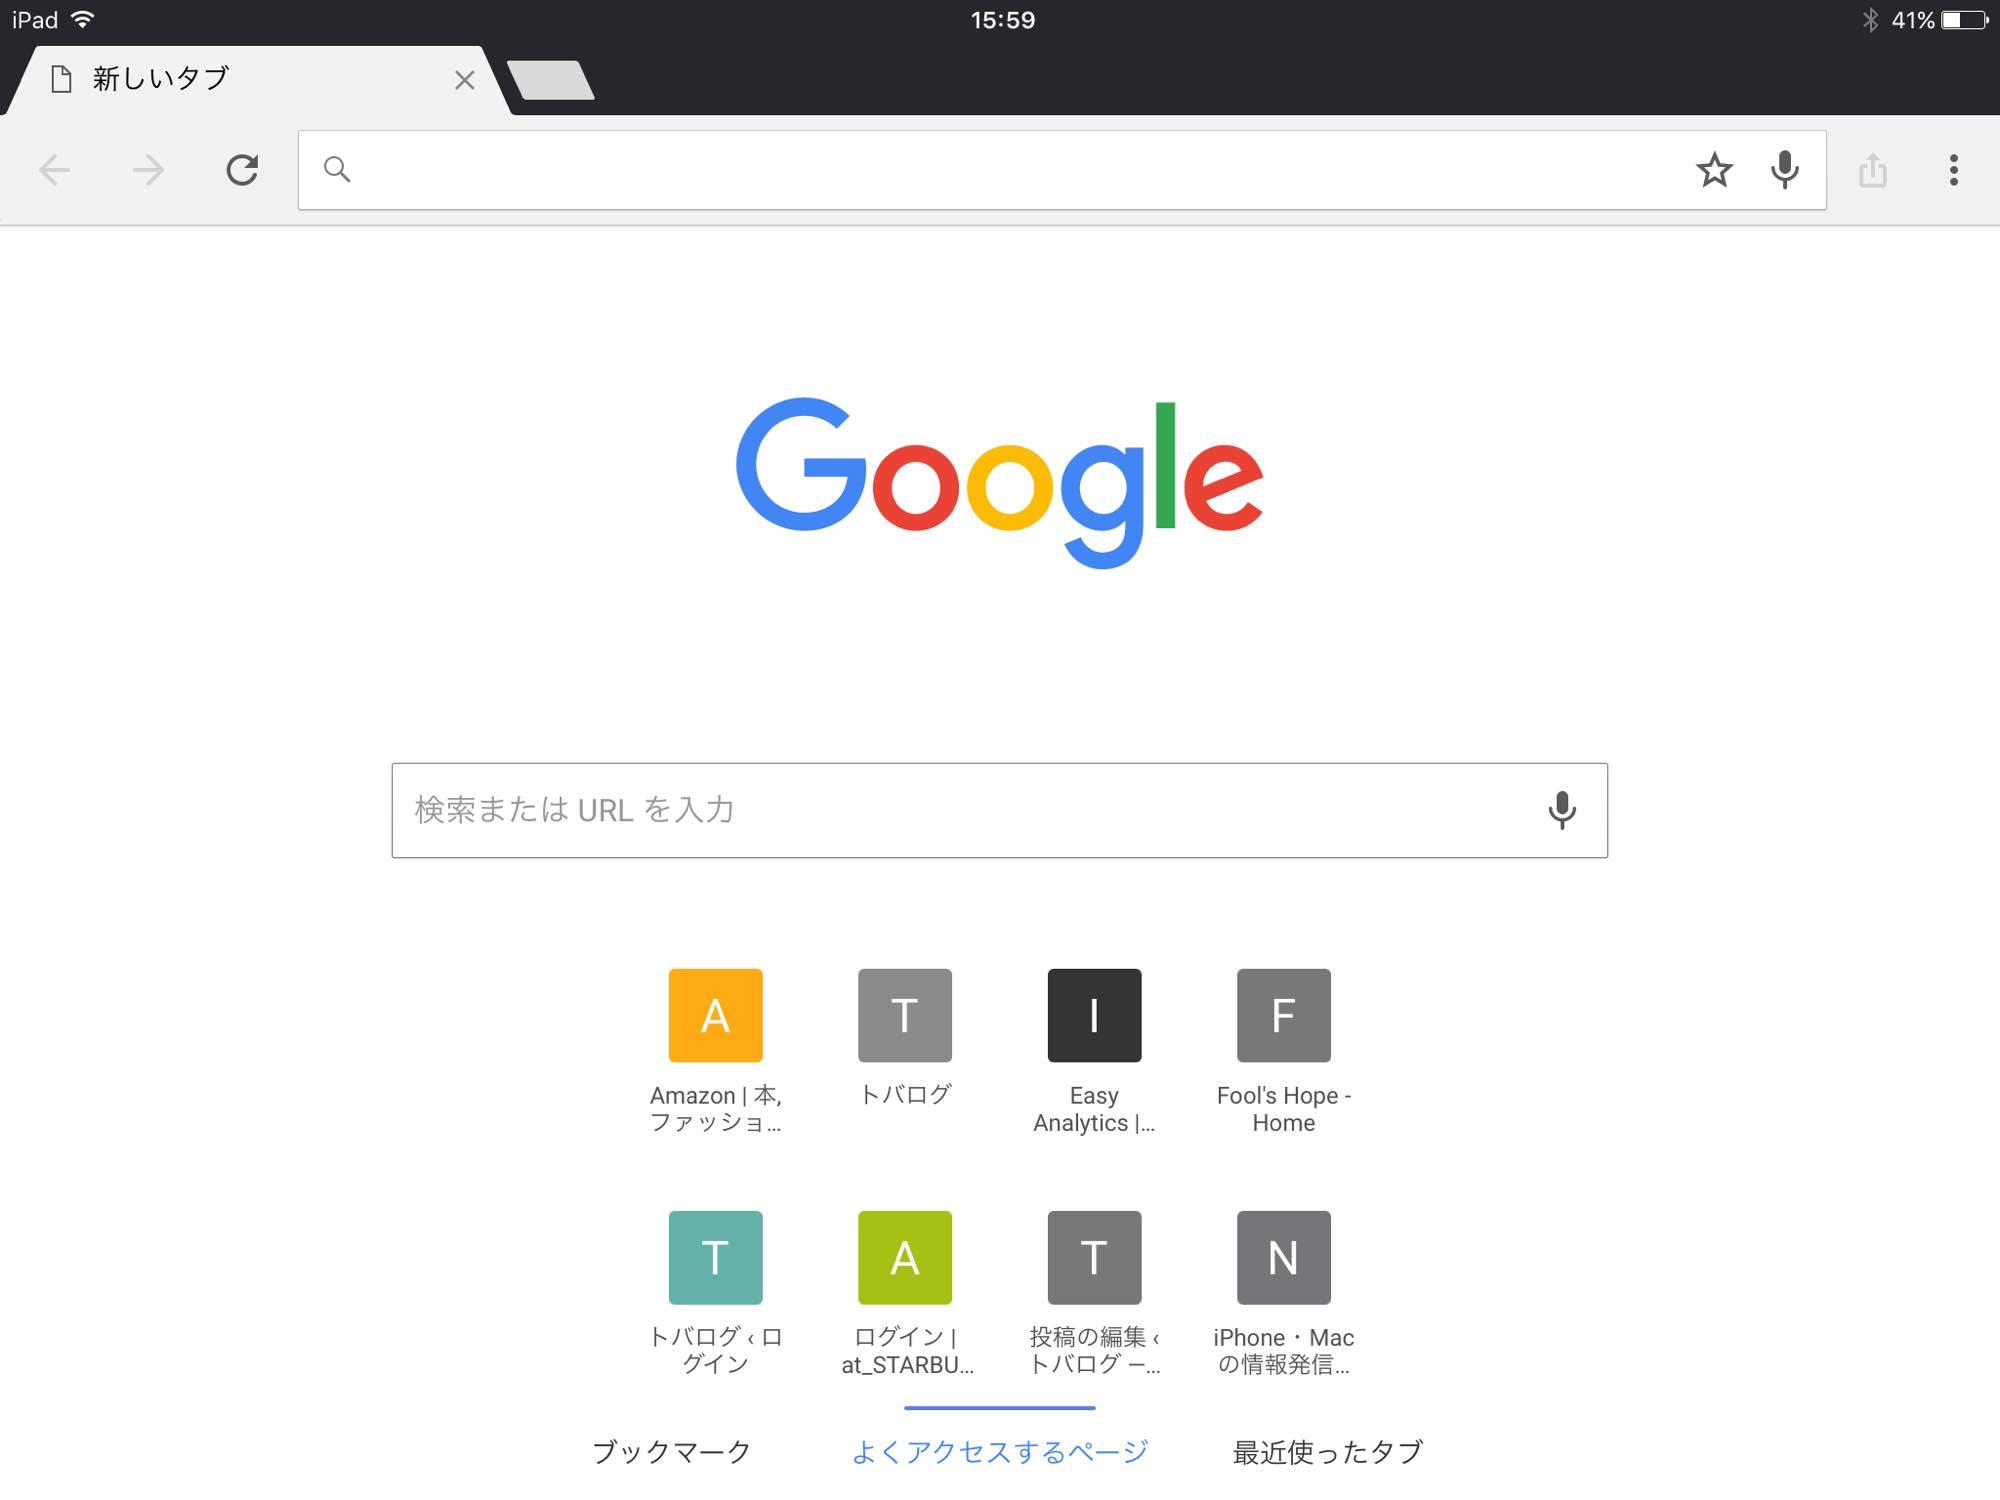 ipad-pro-apps5